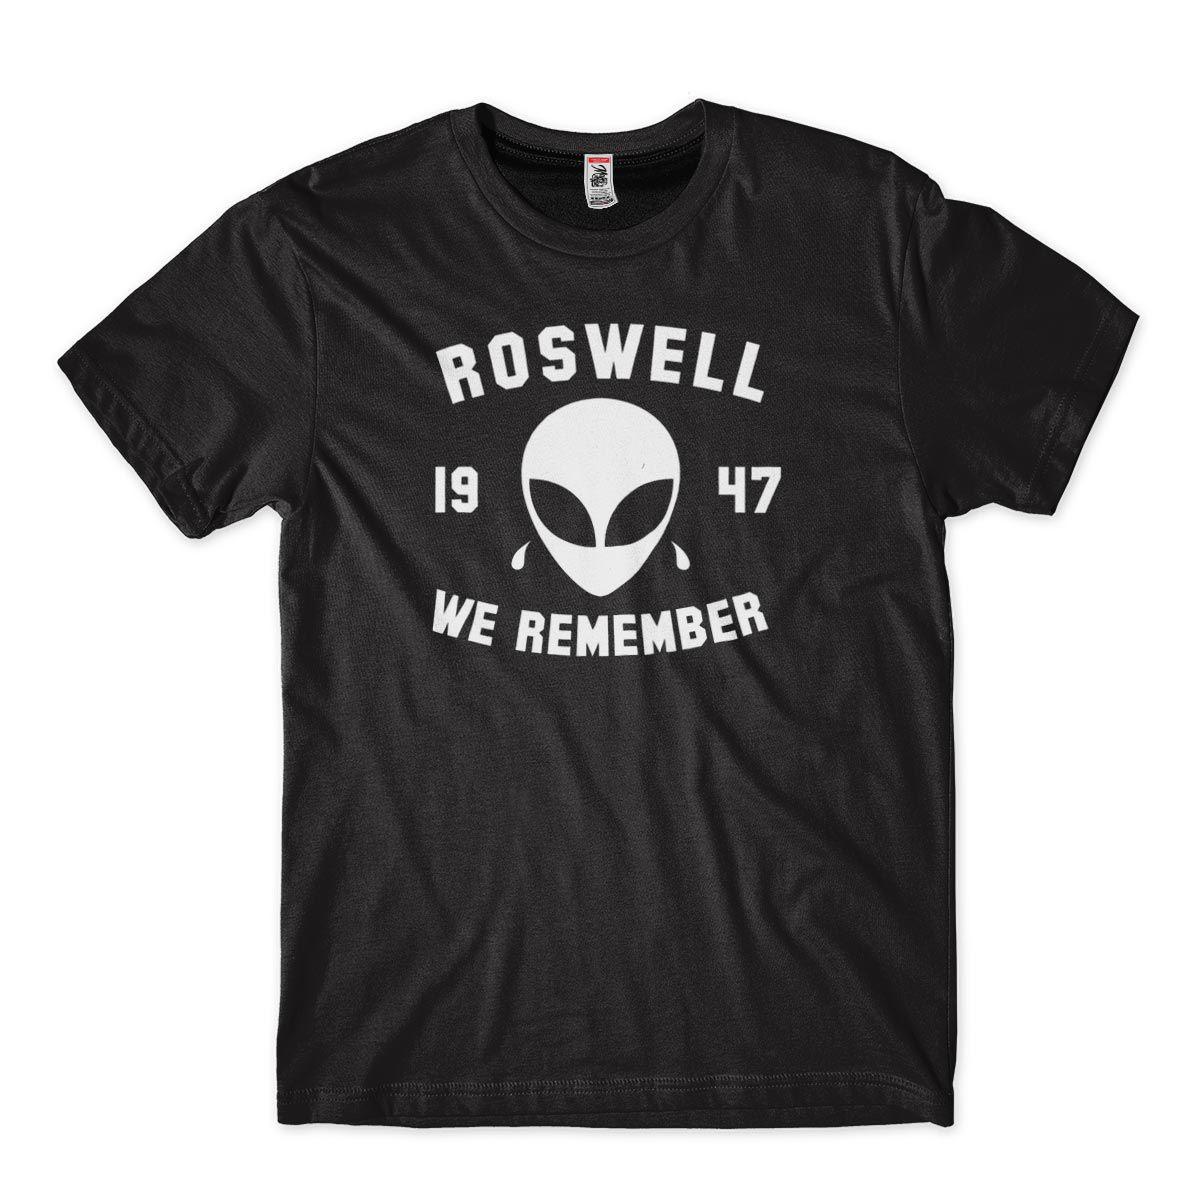 Camisa Masculina Alien Roswel 1947 We Remember